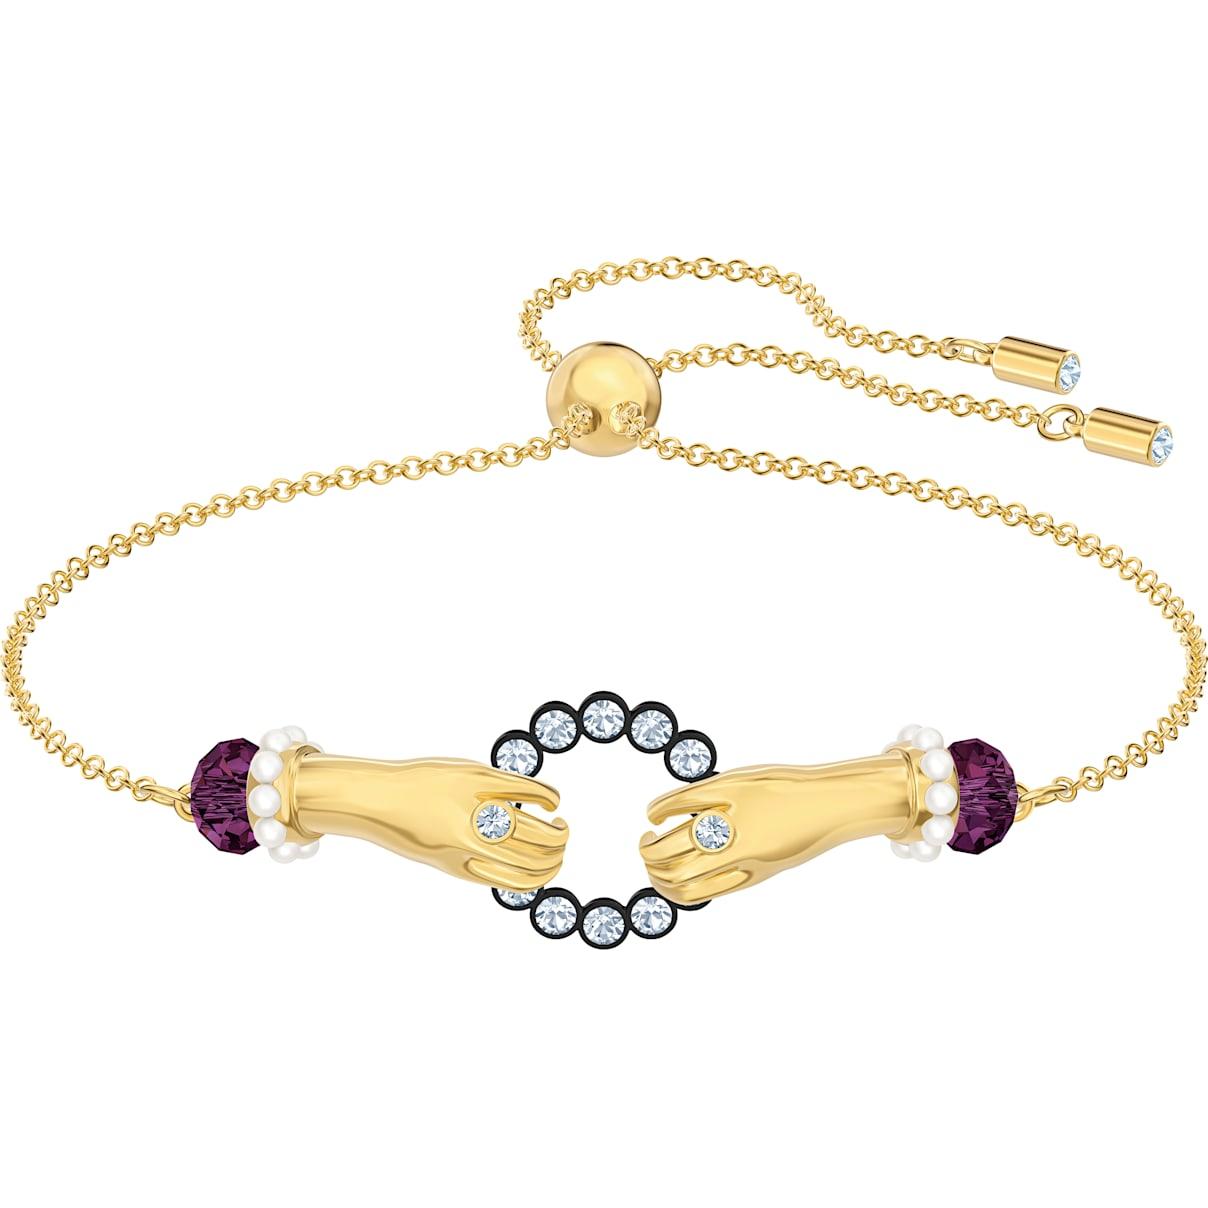 Swarovski Tarot Magic Bracelet, Multi-colored, Gold-tone plated